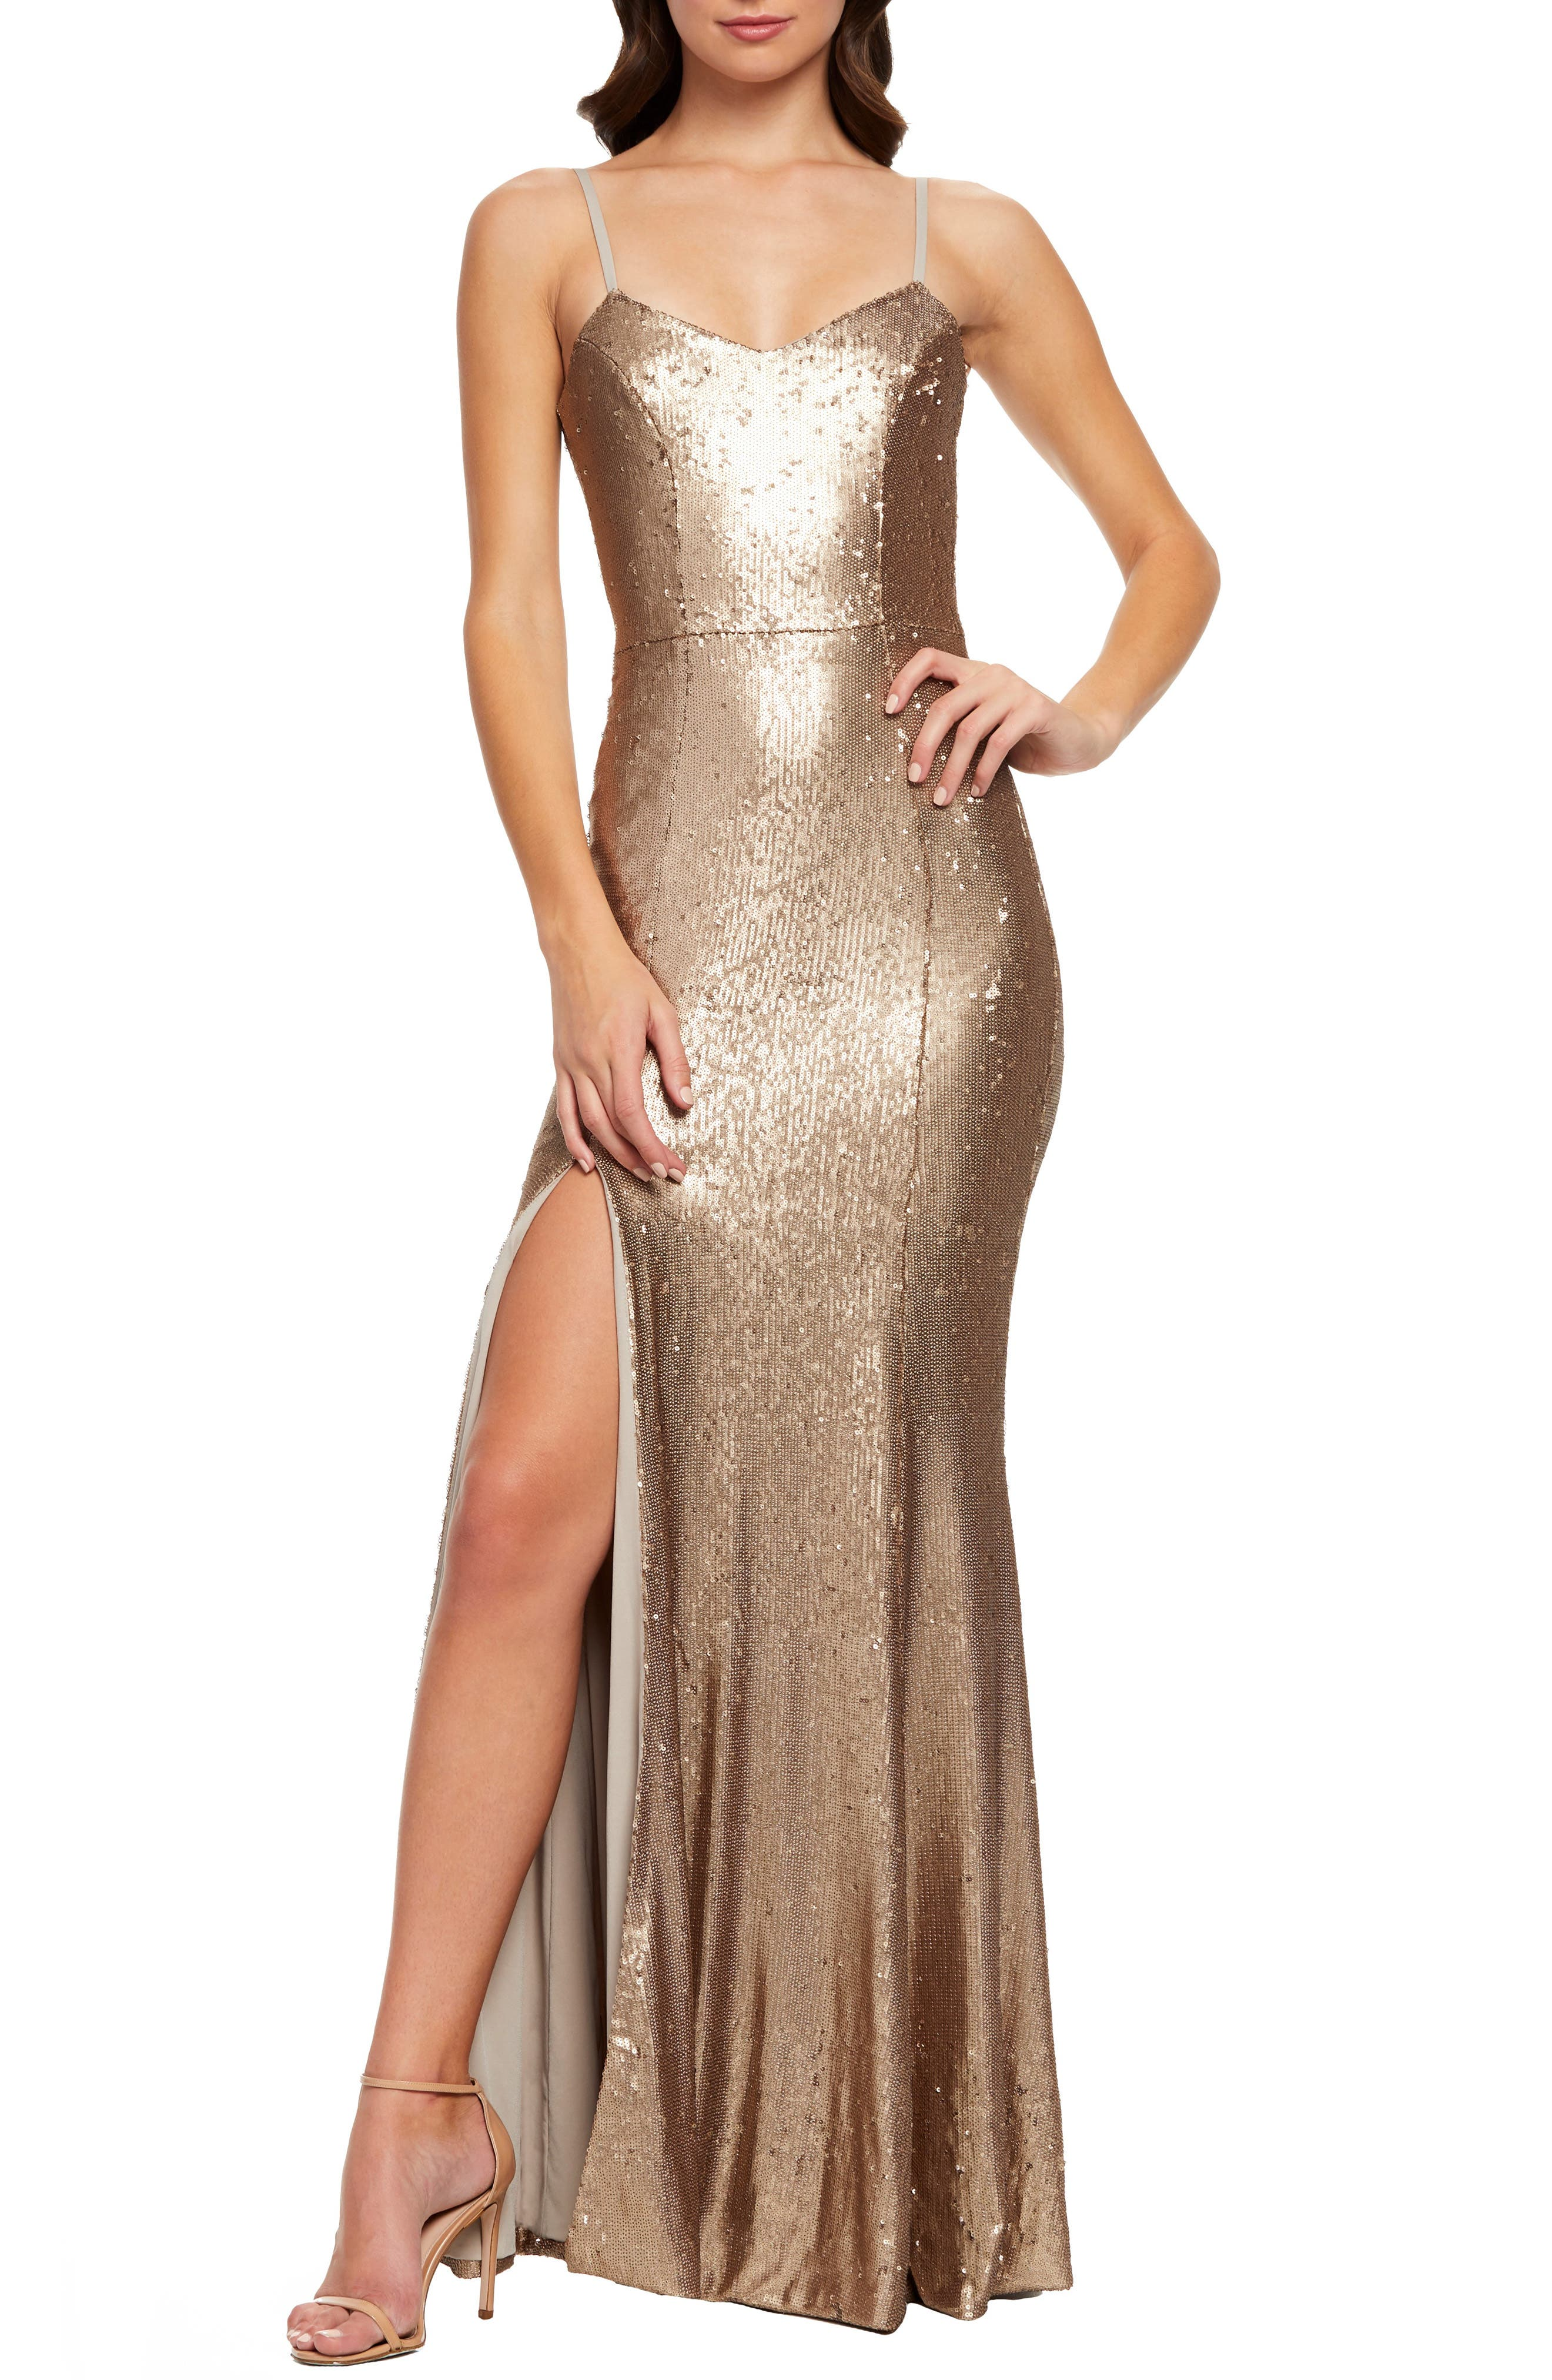 70s Prom, Formal, Evening, Party Dresses Womens Dress The Population Ingrid Sequin Evening Dress $319.00 AT vintagedancer.com